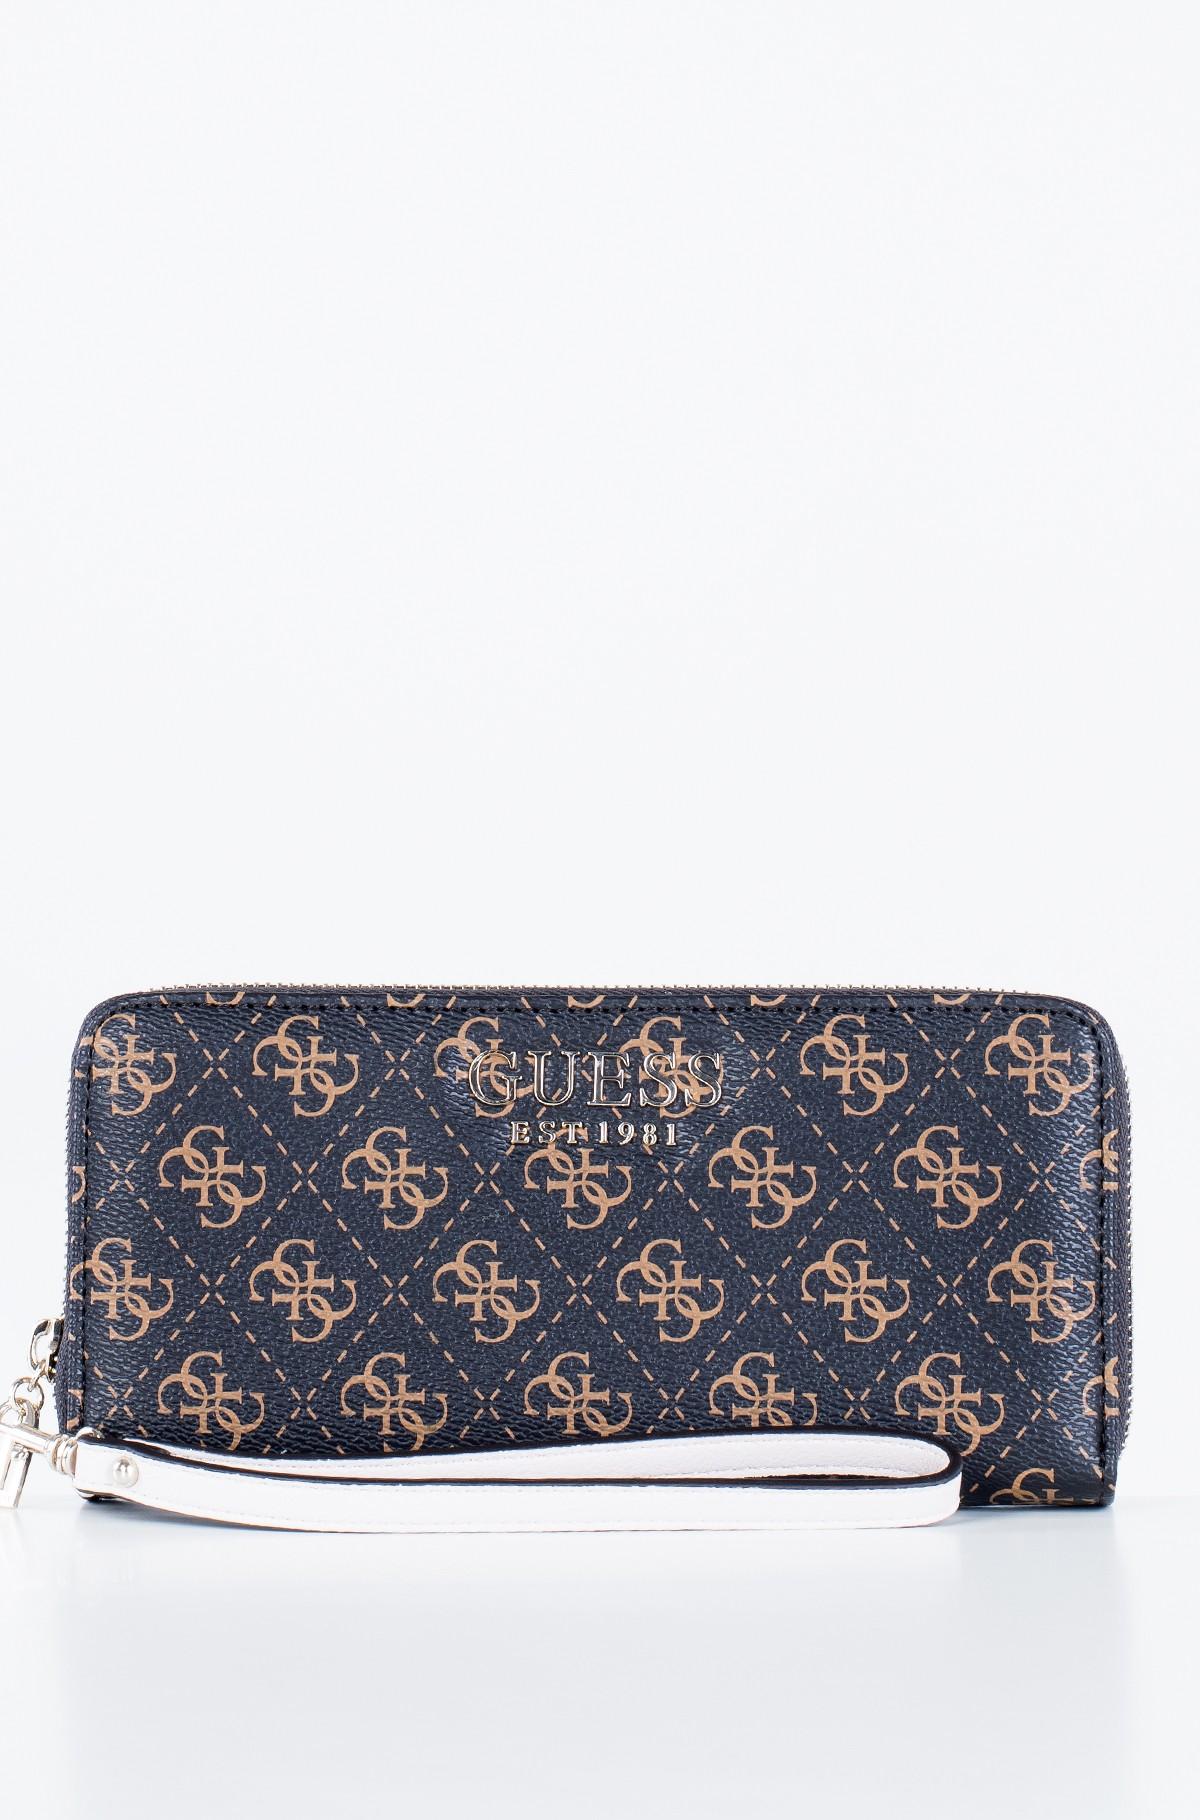 Wallet SWSG76 71460-full-1